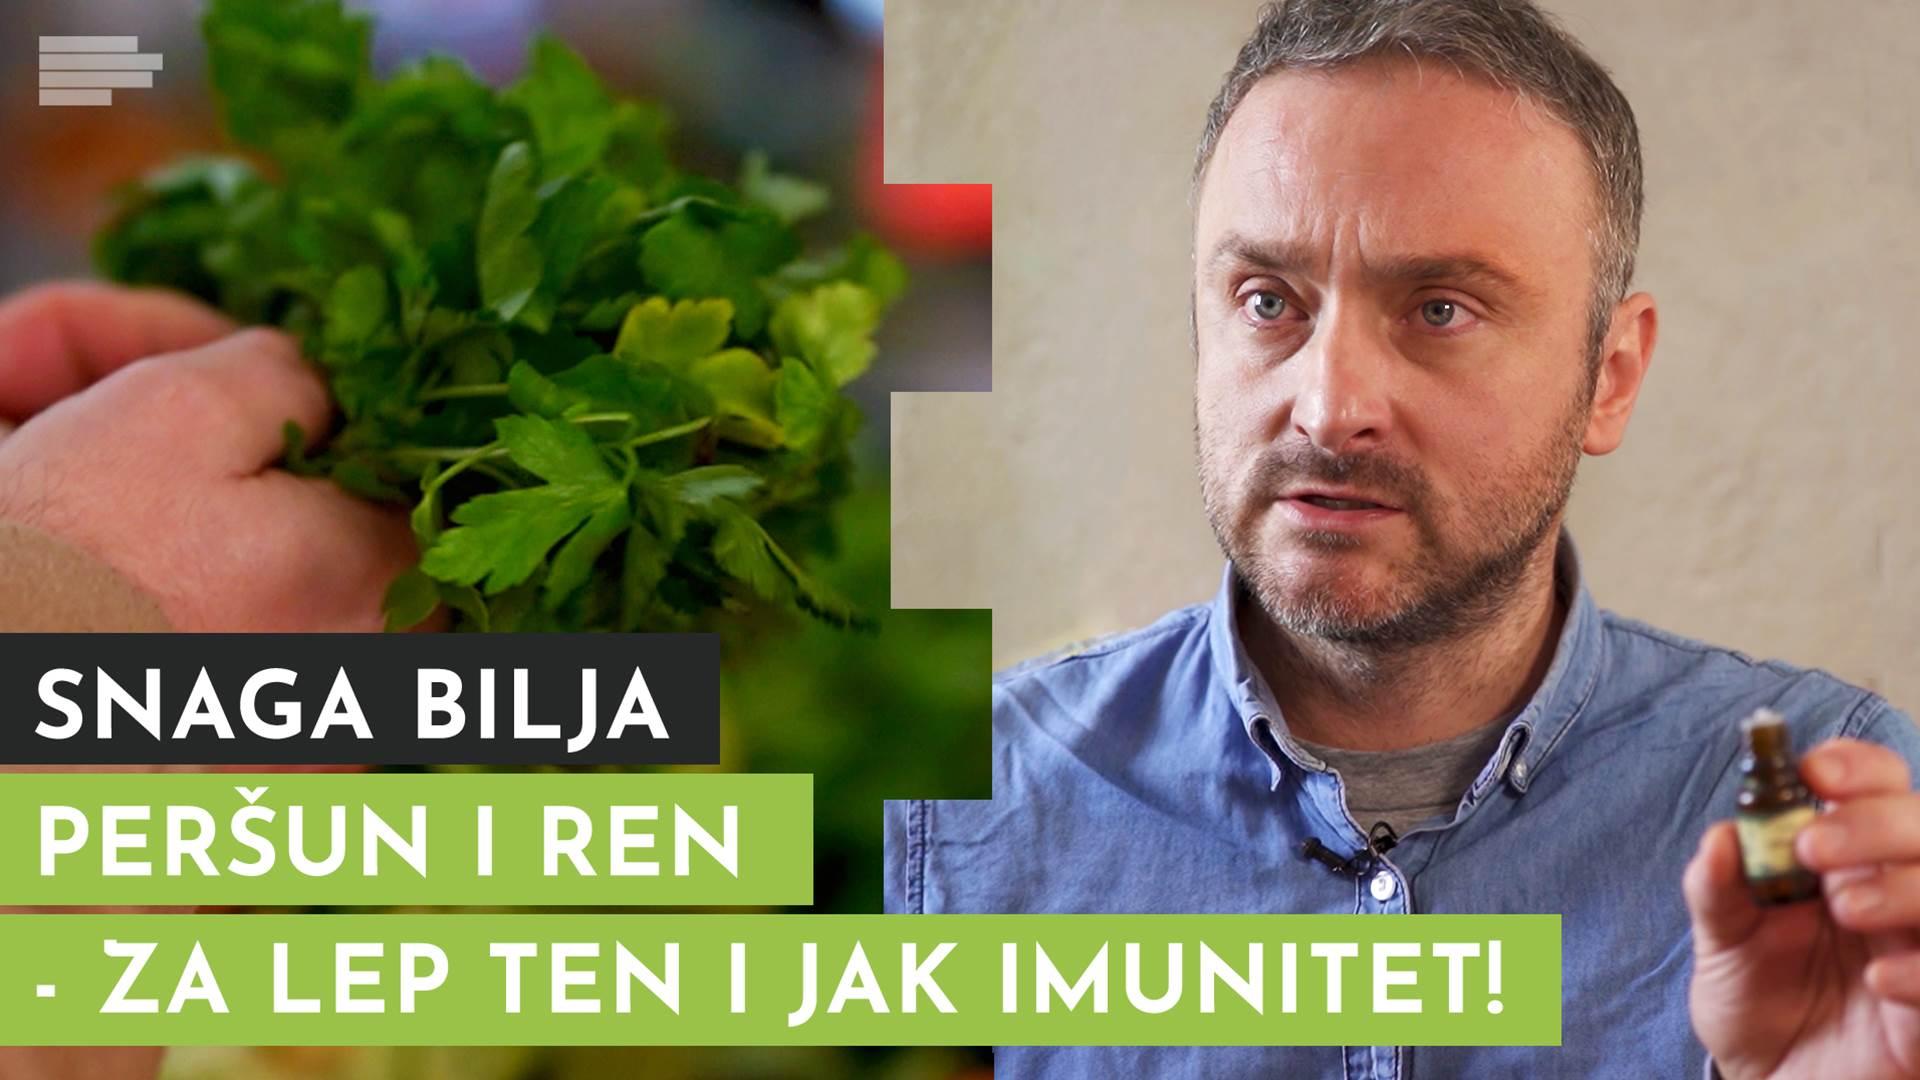 Peršun i ren - i za zdravlje i za rinflajš (VIDEO)